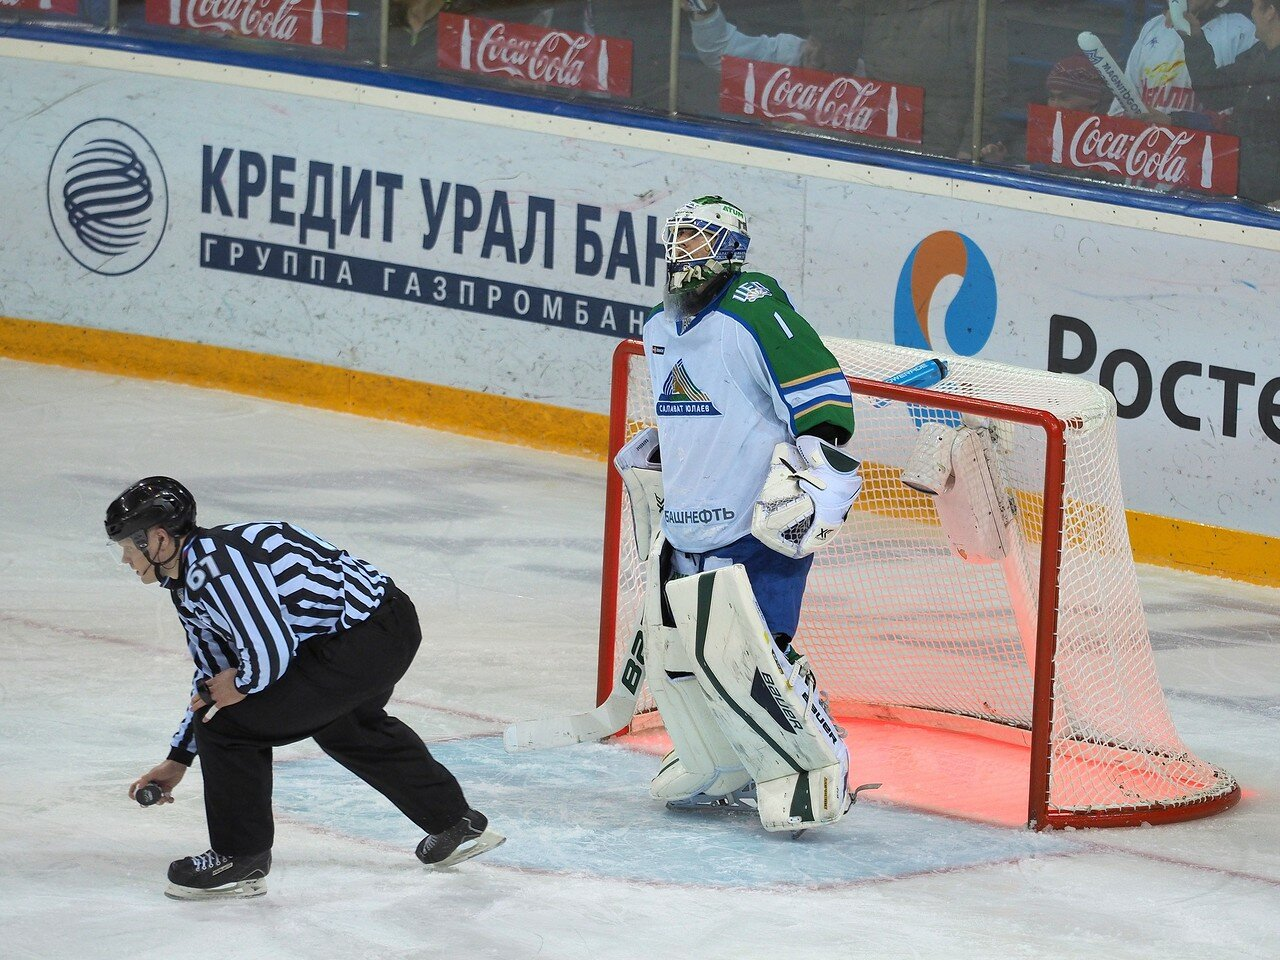 66Плей-офф 2016 Восток Финал Металлург - Салават Юлаев 31.03.2016